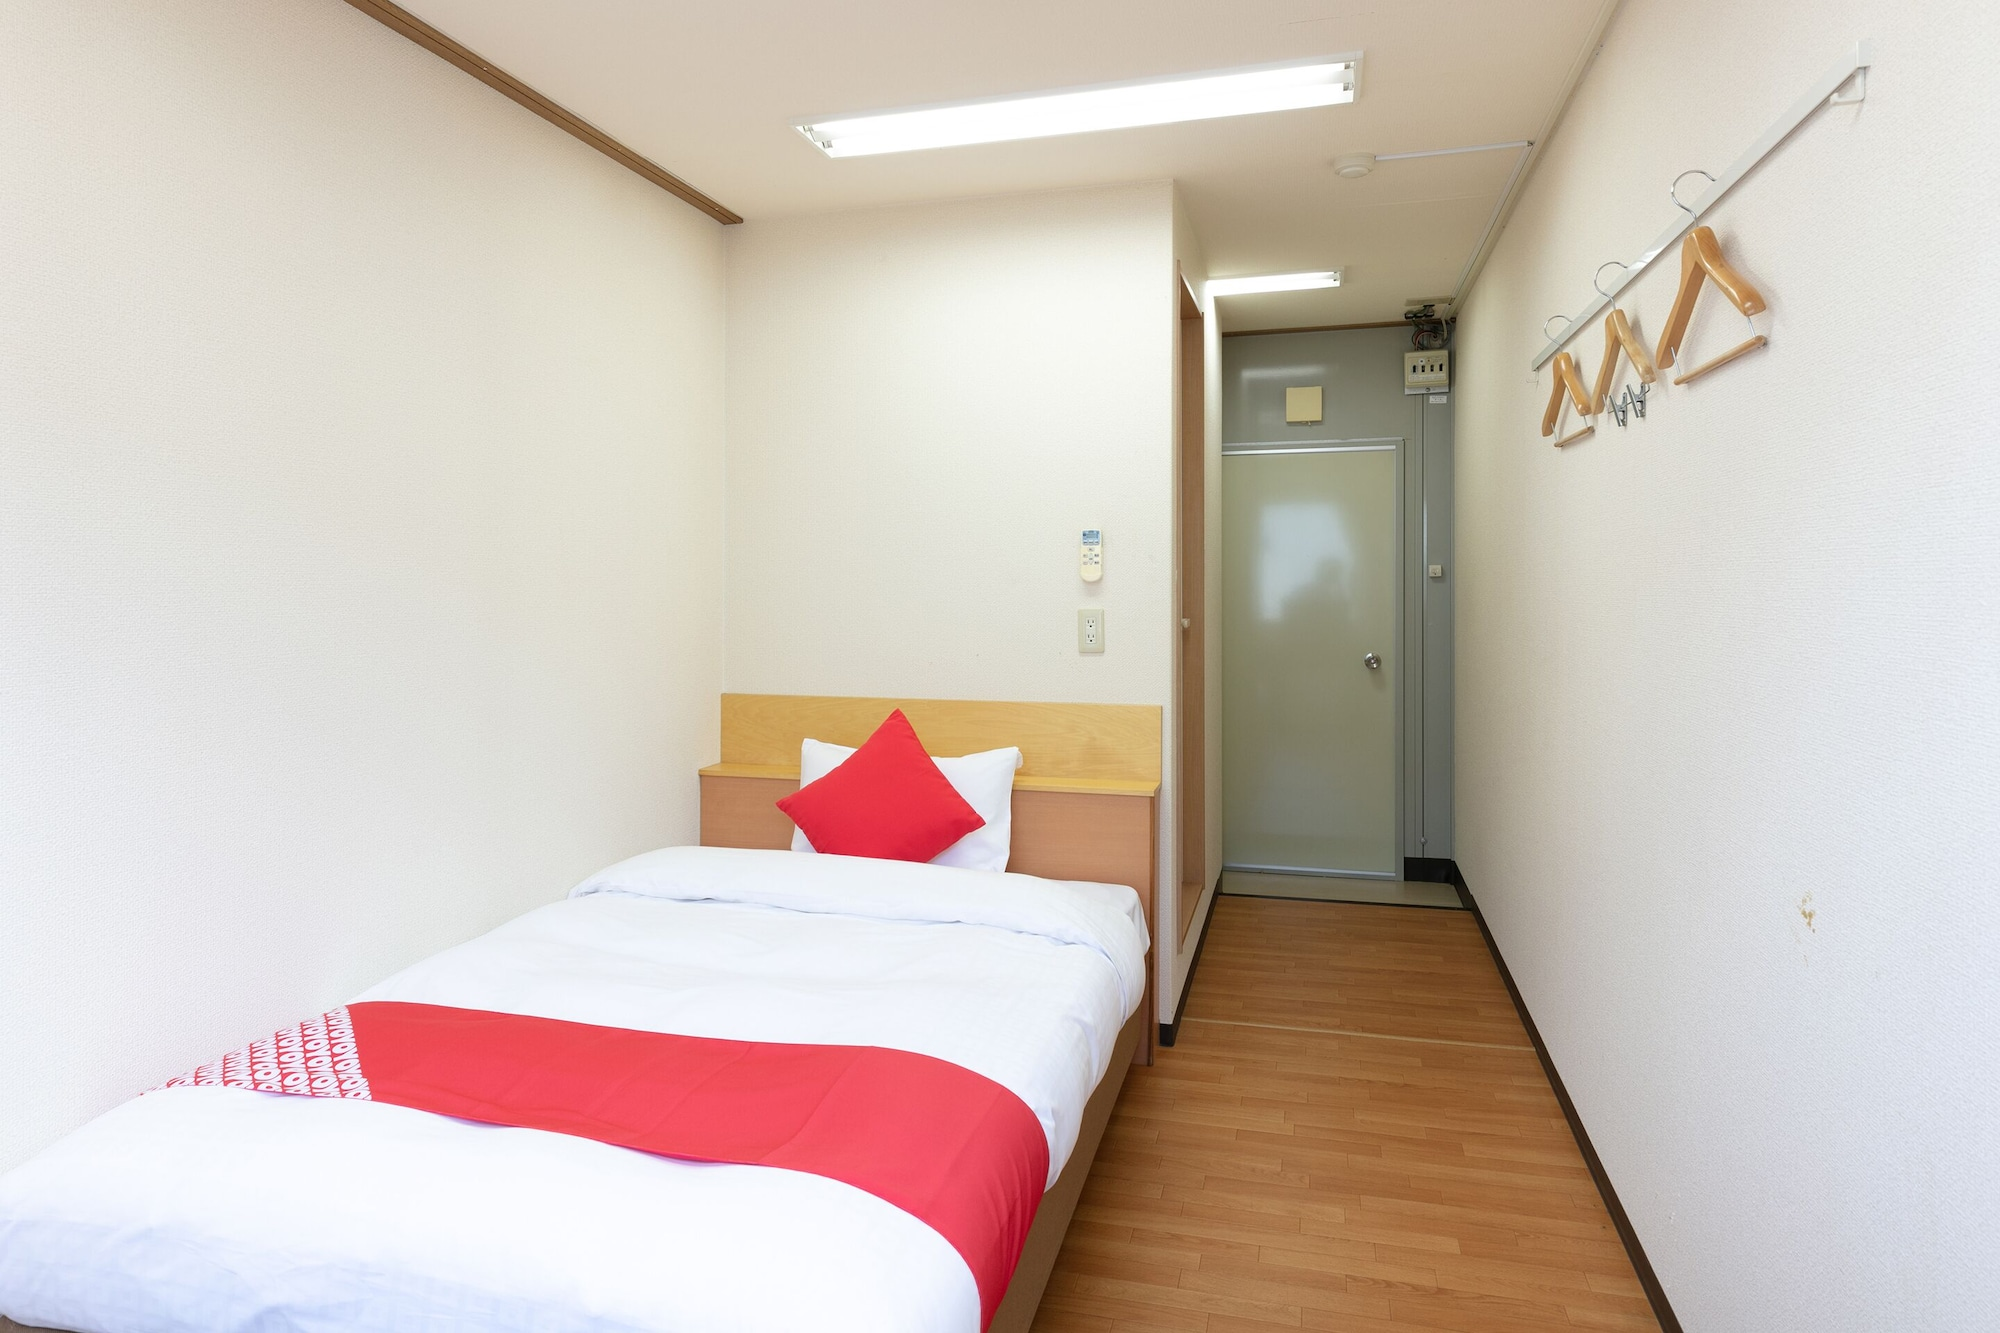 OYO Hotel Maple Terrace Ishinomaki-Kanomata, Ishinomaki